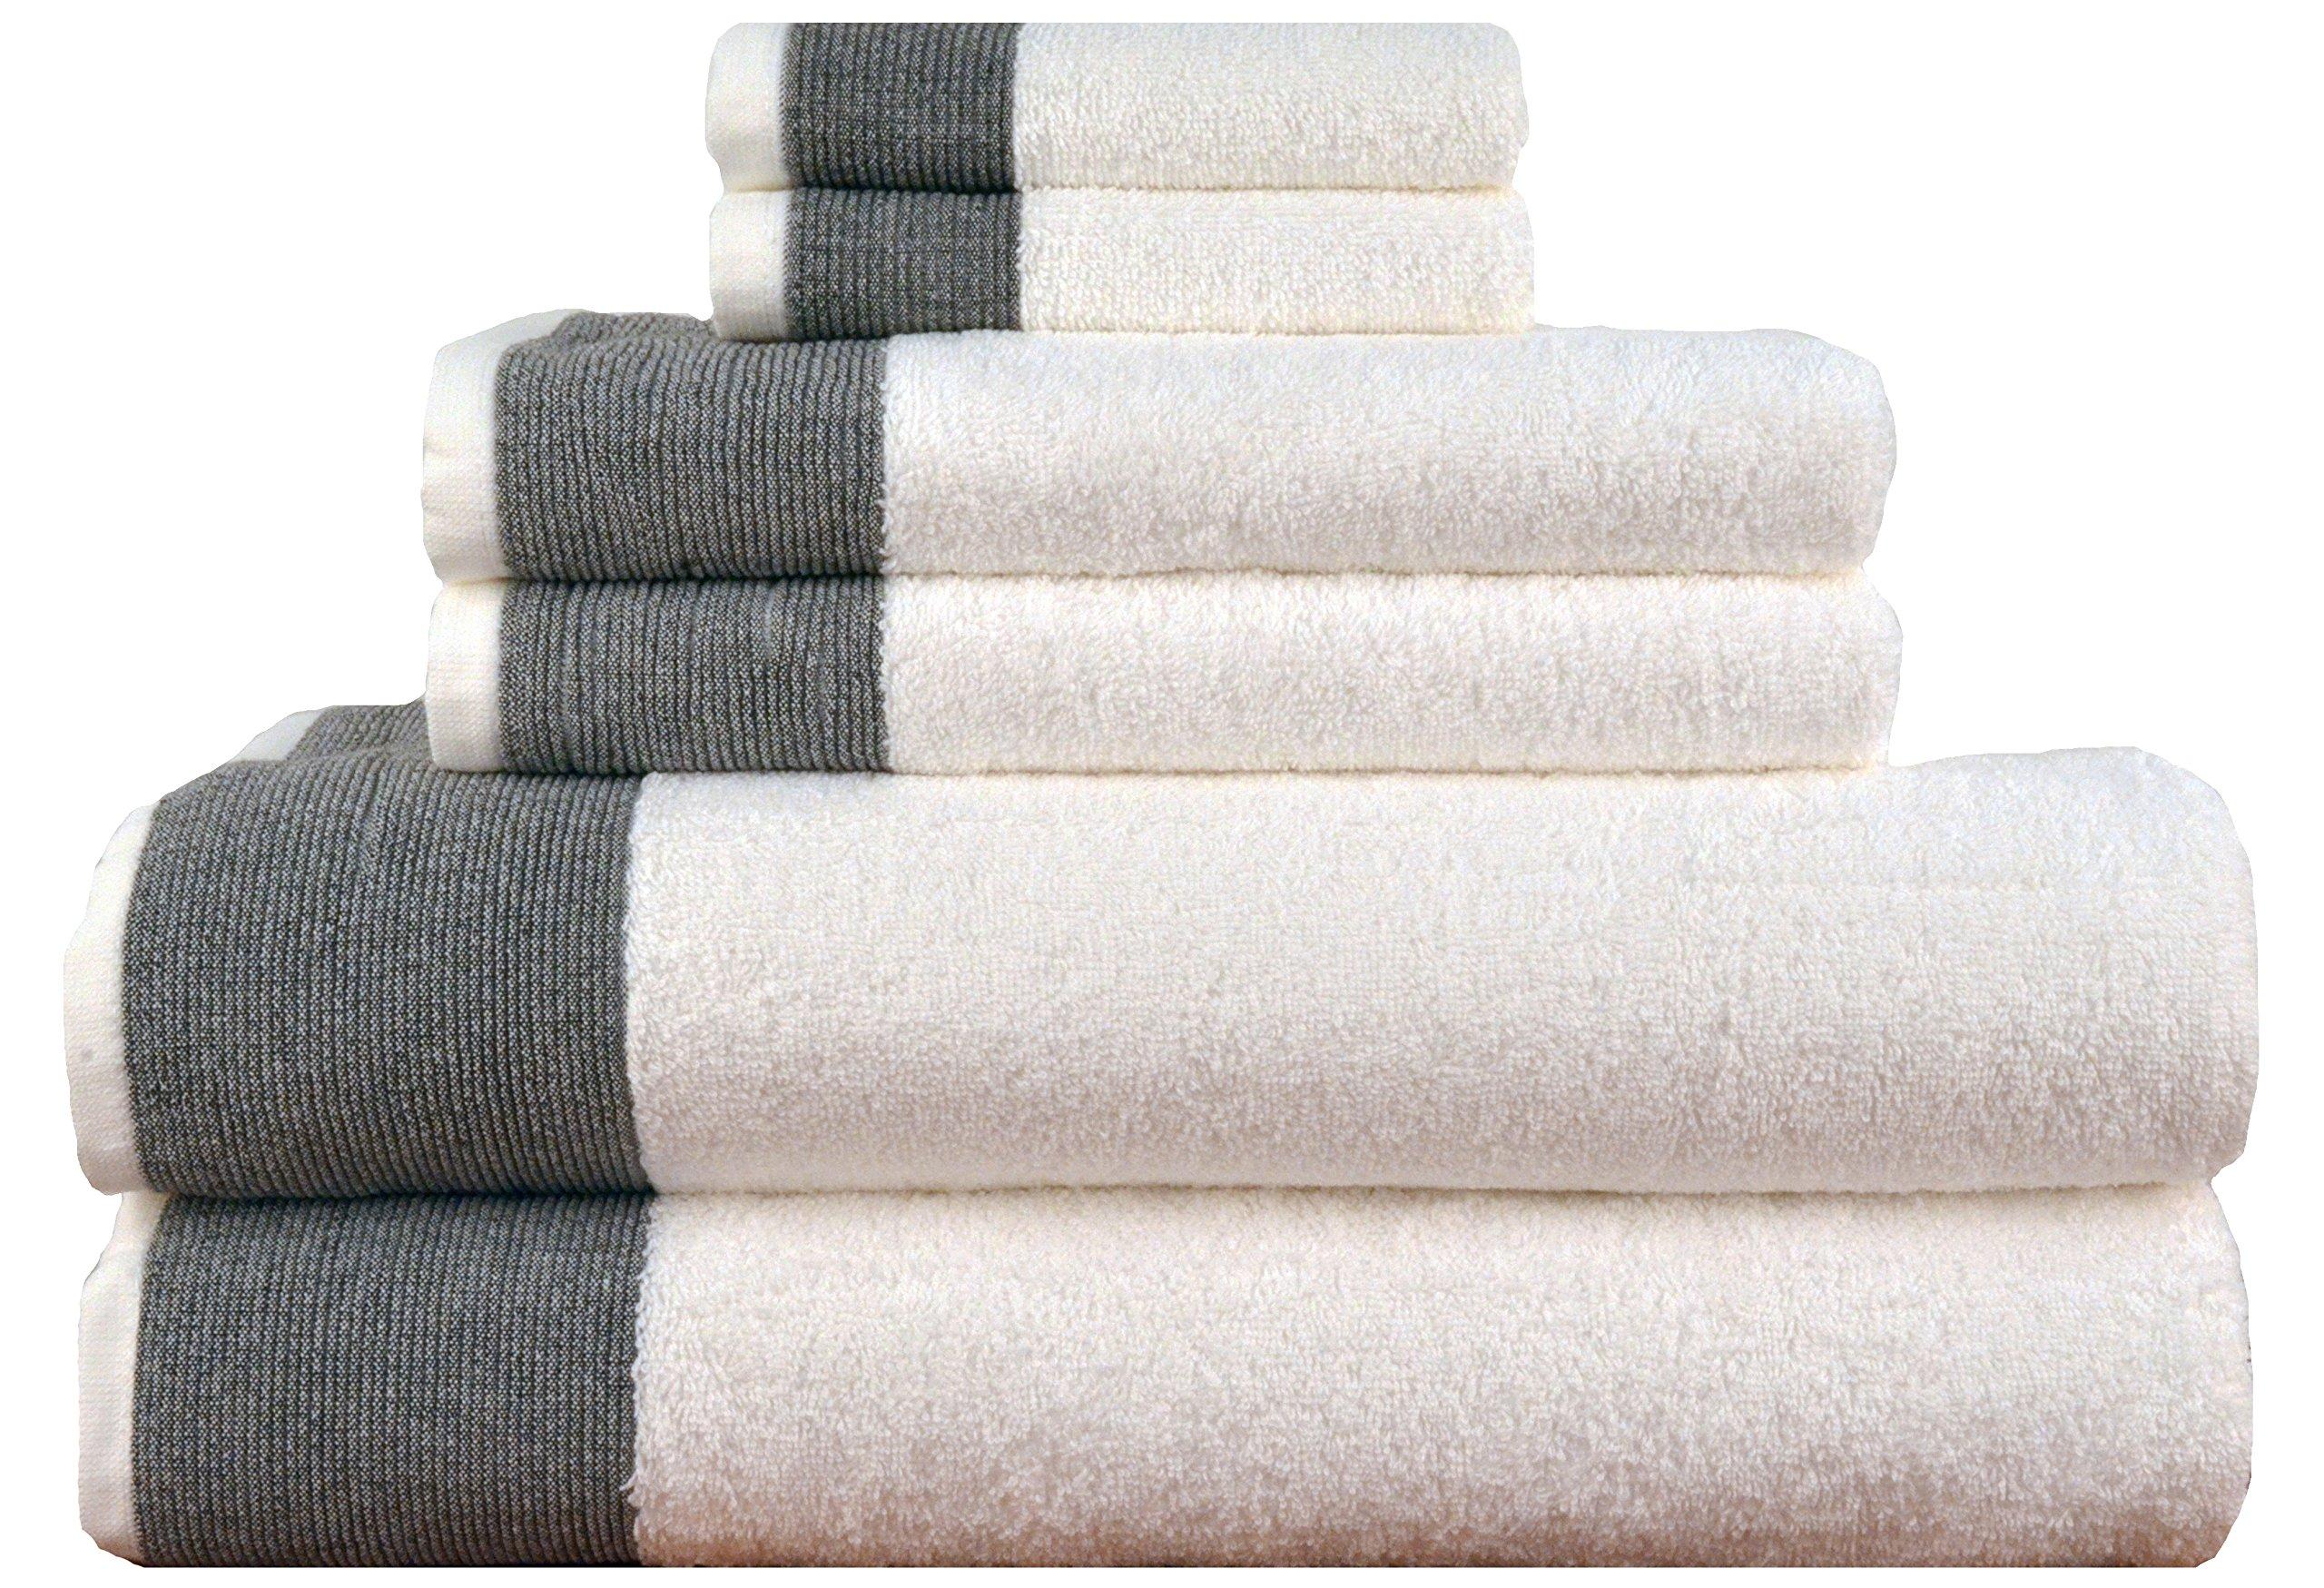 LUNASIDUS CTT-100 Venice Luxury Hotel & Spa Premium 6Piece Towel Set, 100% Turkish Cotton, Towel Sets, White Towel, Black